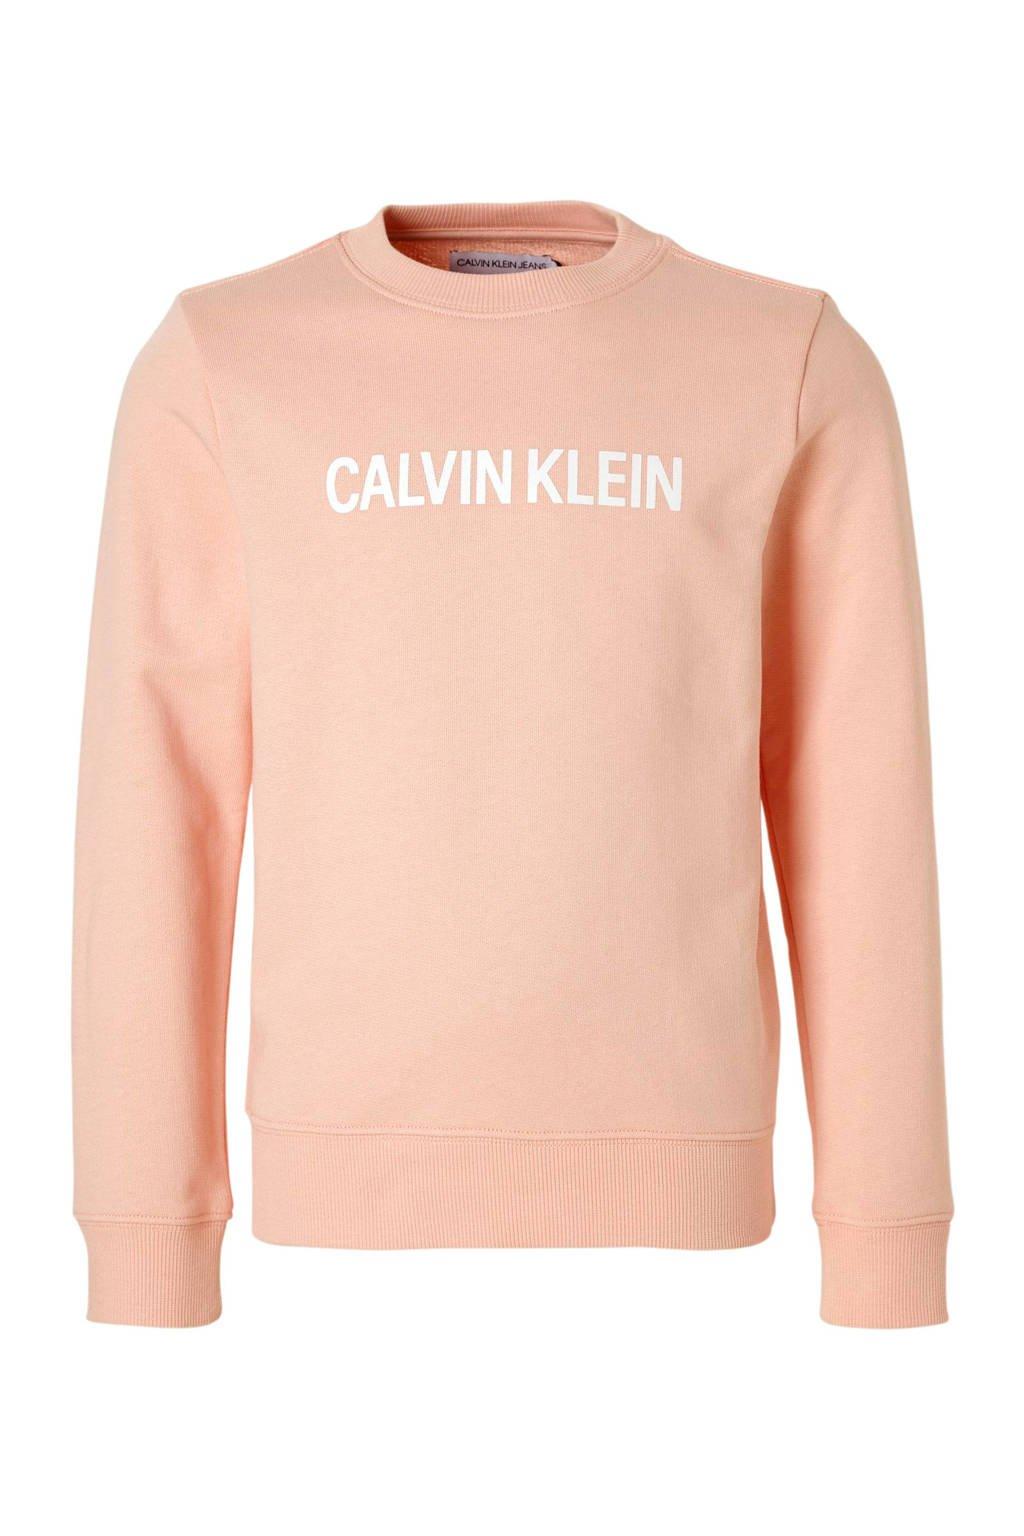 Calvin Klein Jeans sweater met logo zalmroze, Zalmroze